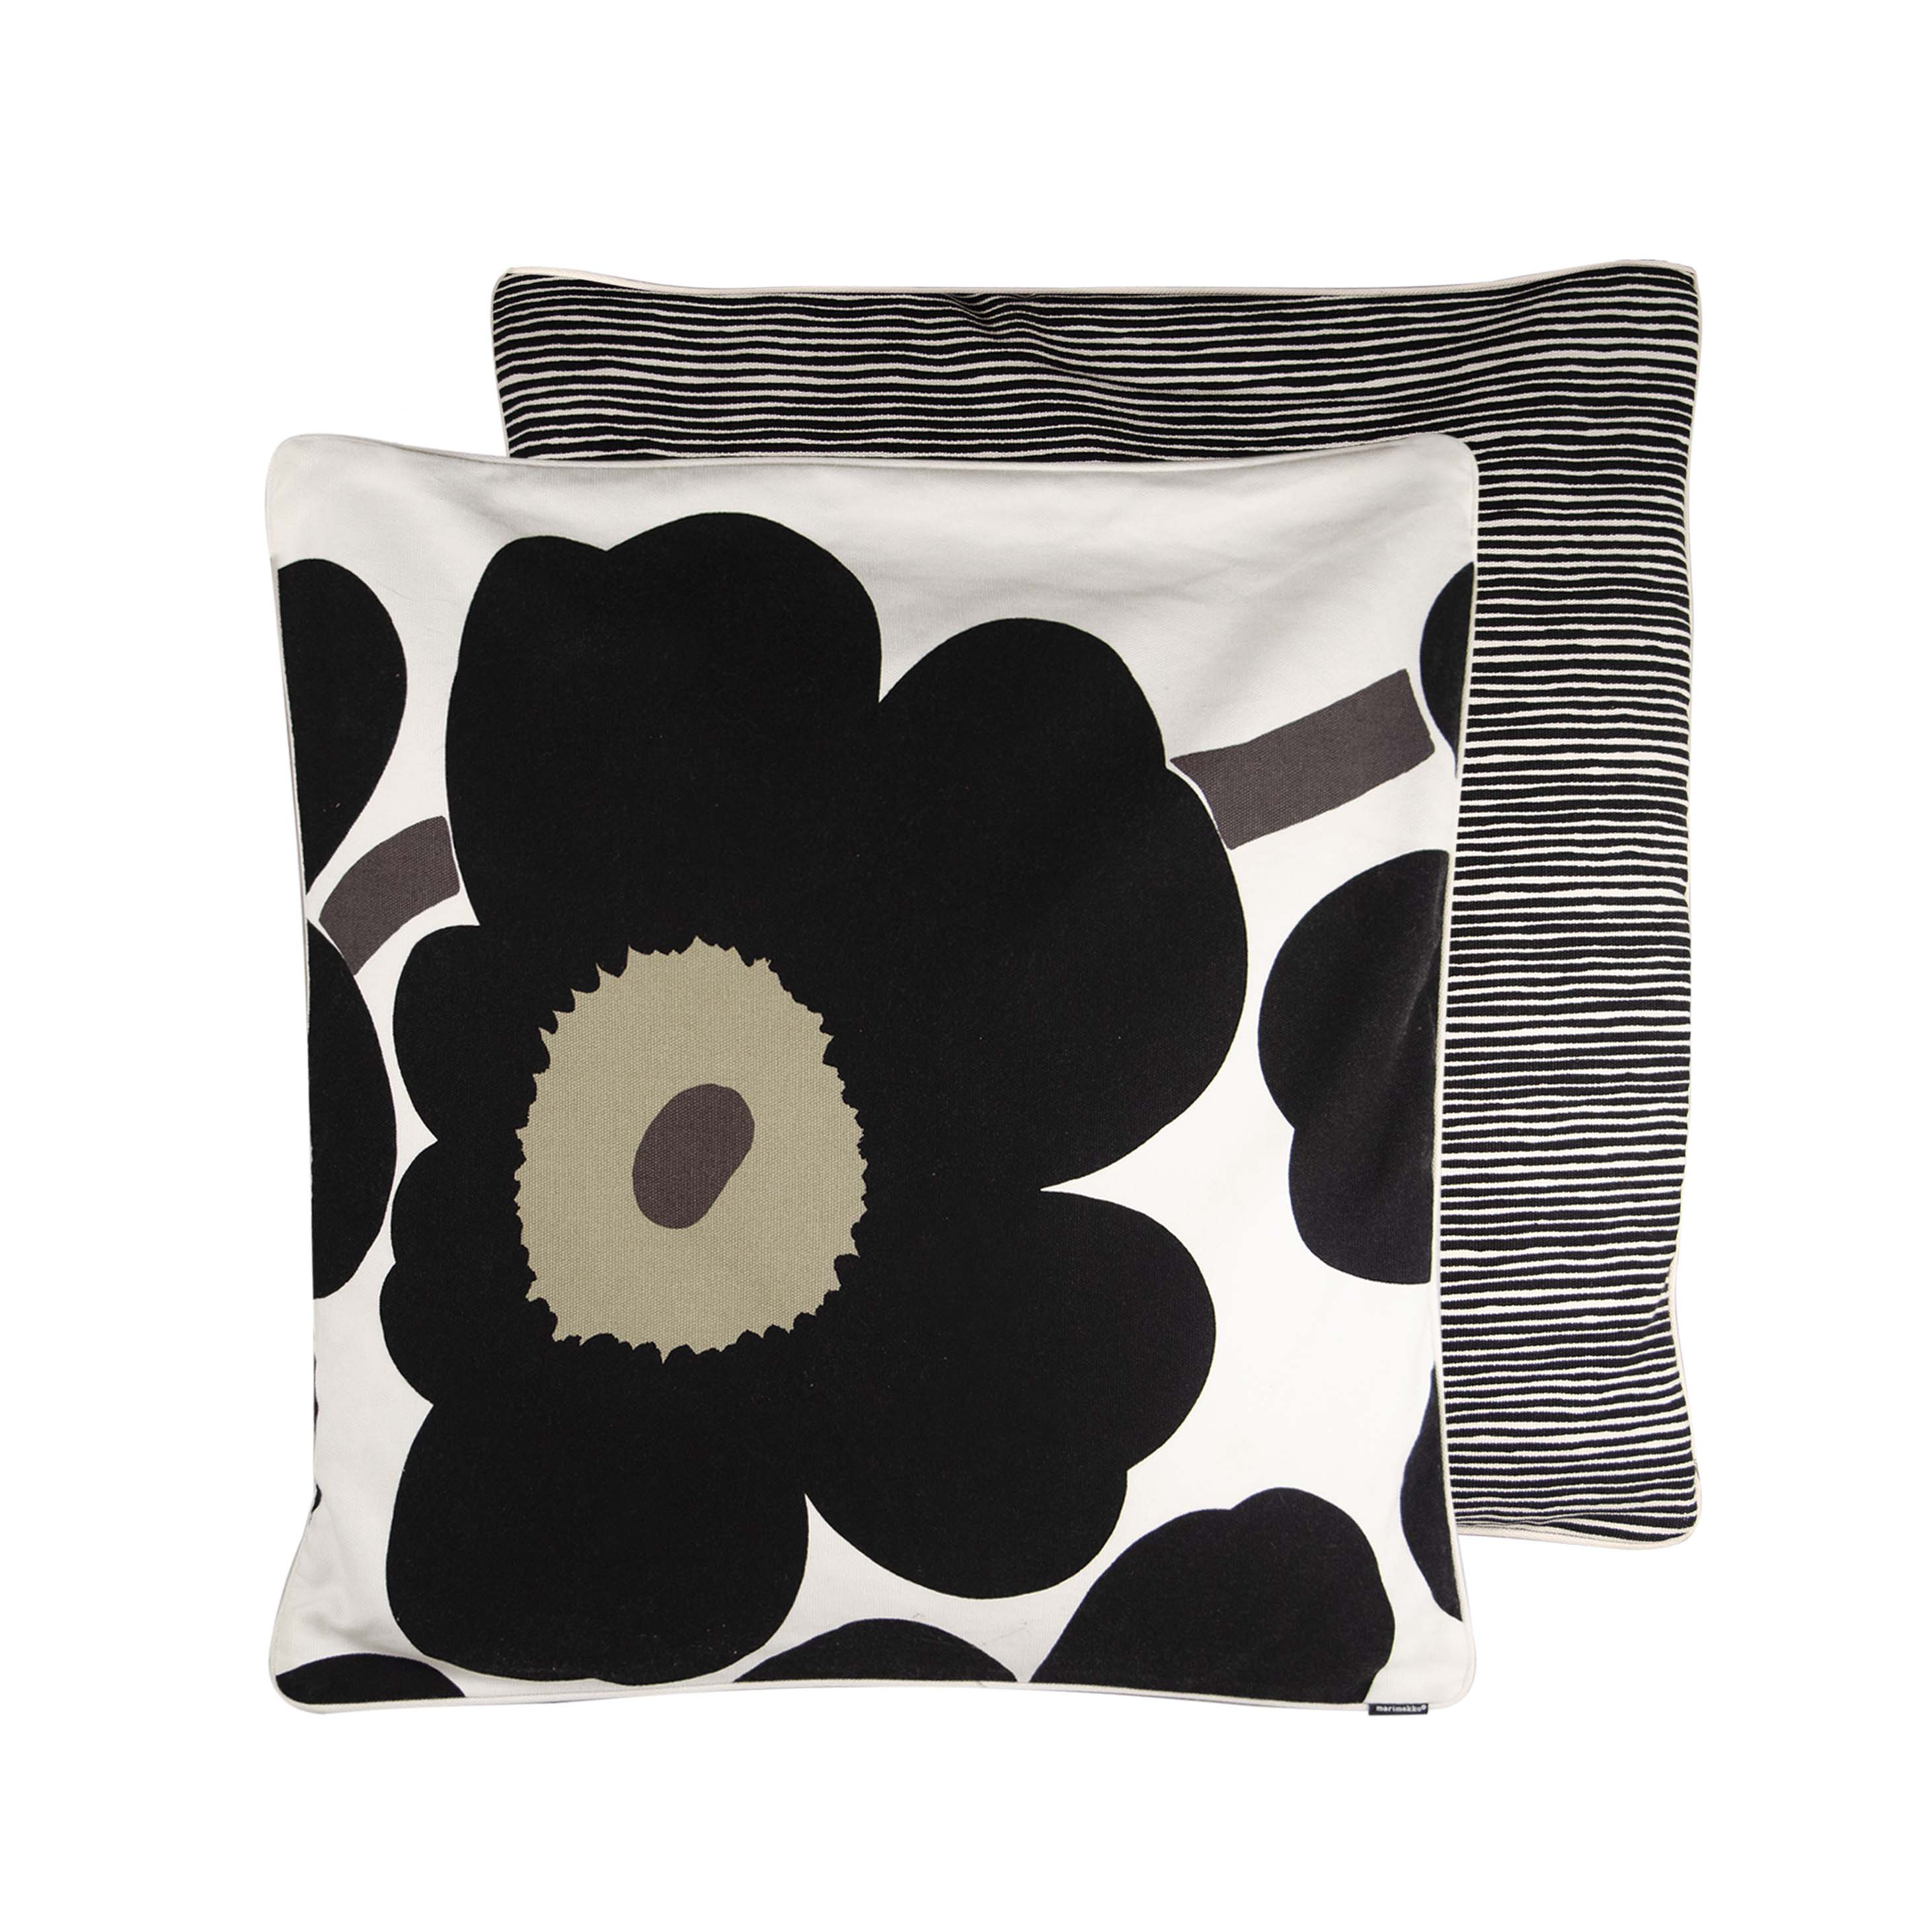 akireh-marimekko-double-side-cushion-black-flowers-stripes-textile-5